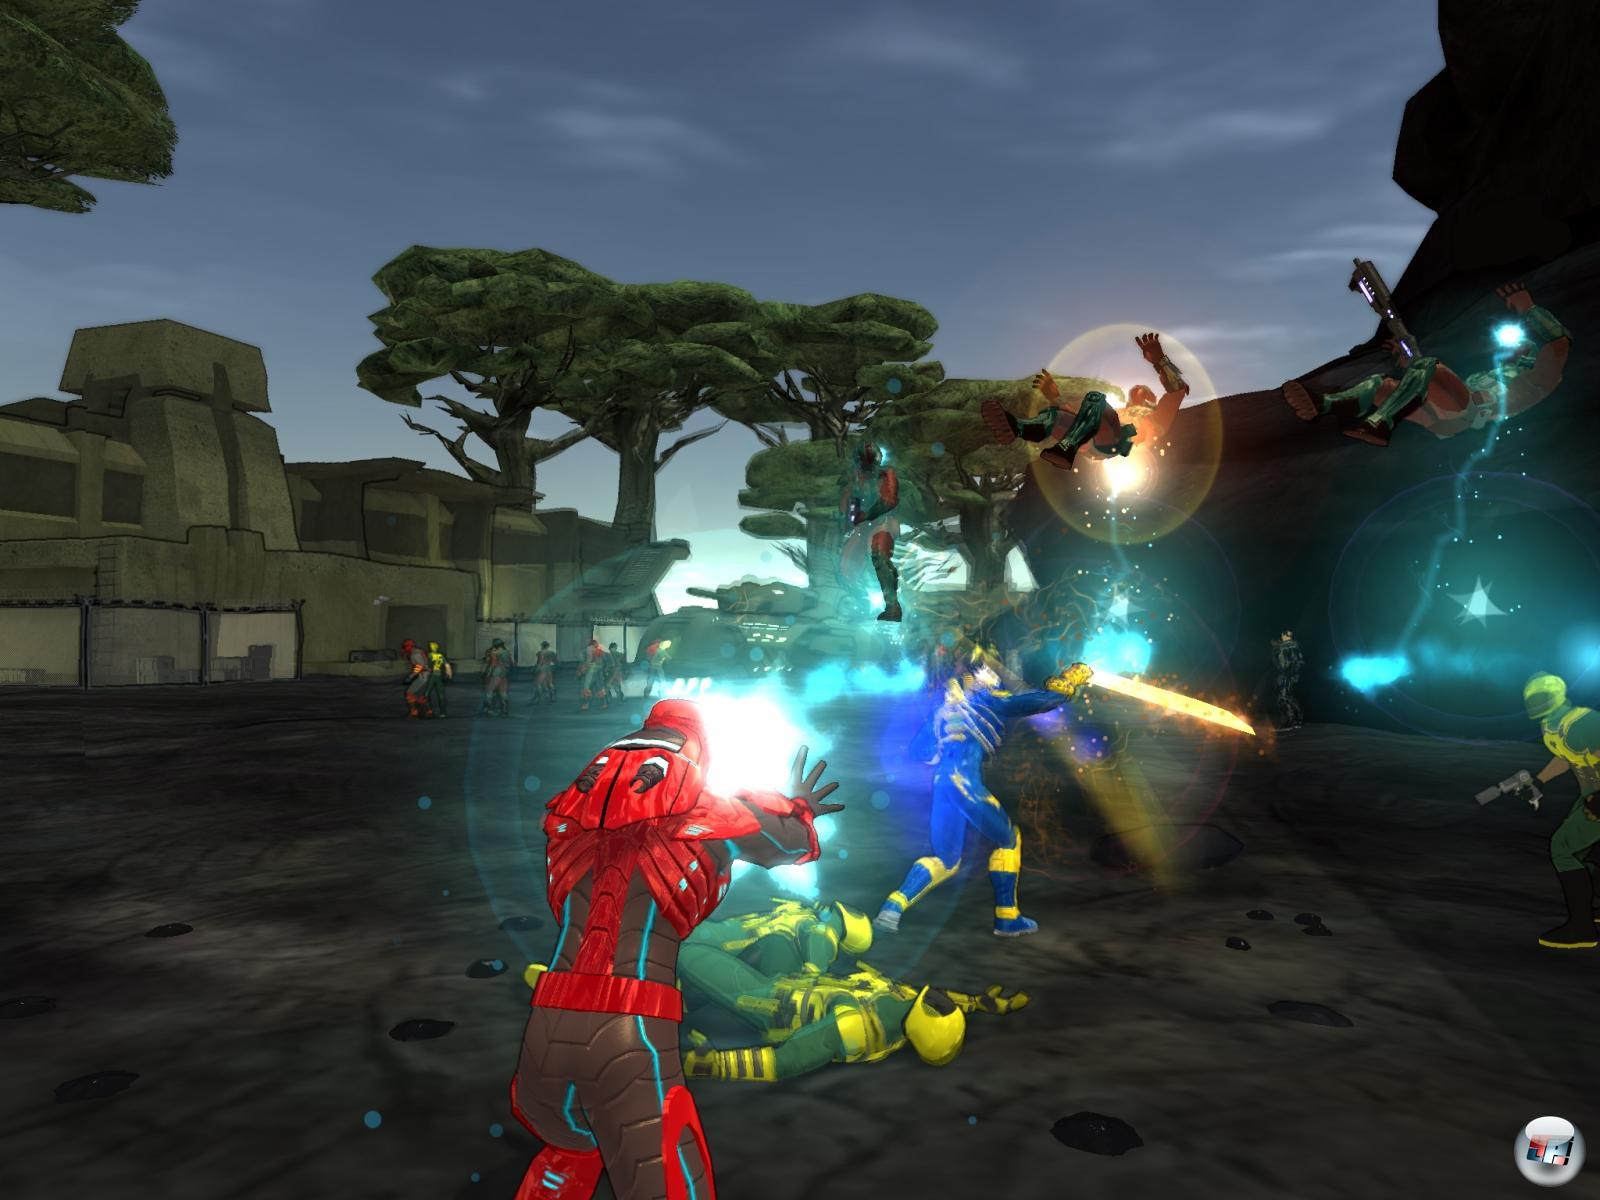 Champions Online - скриншот из игры.